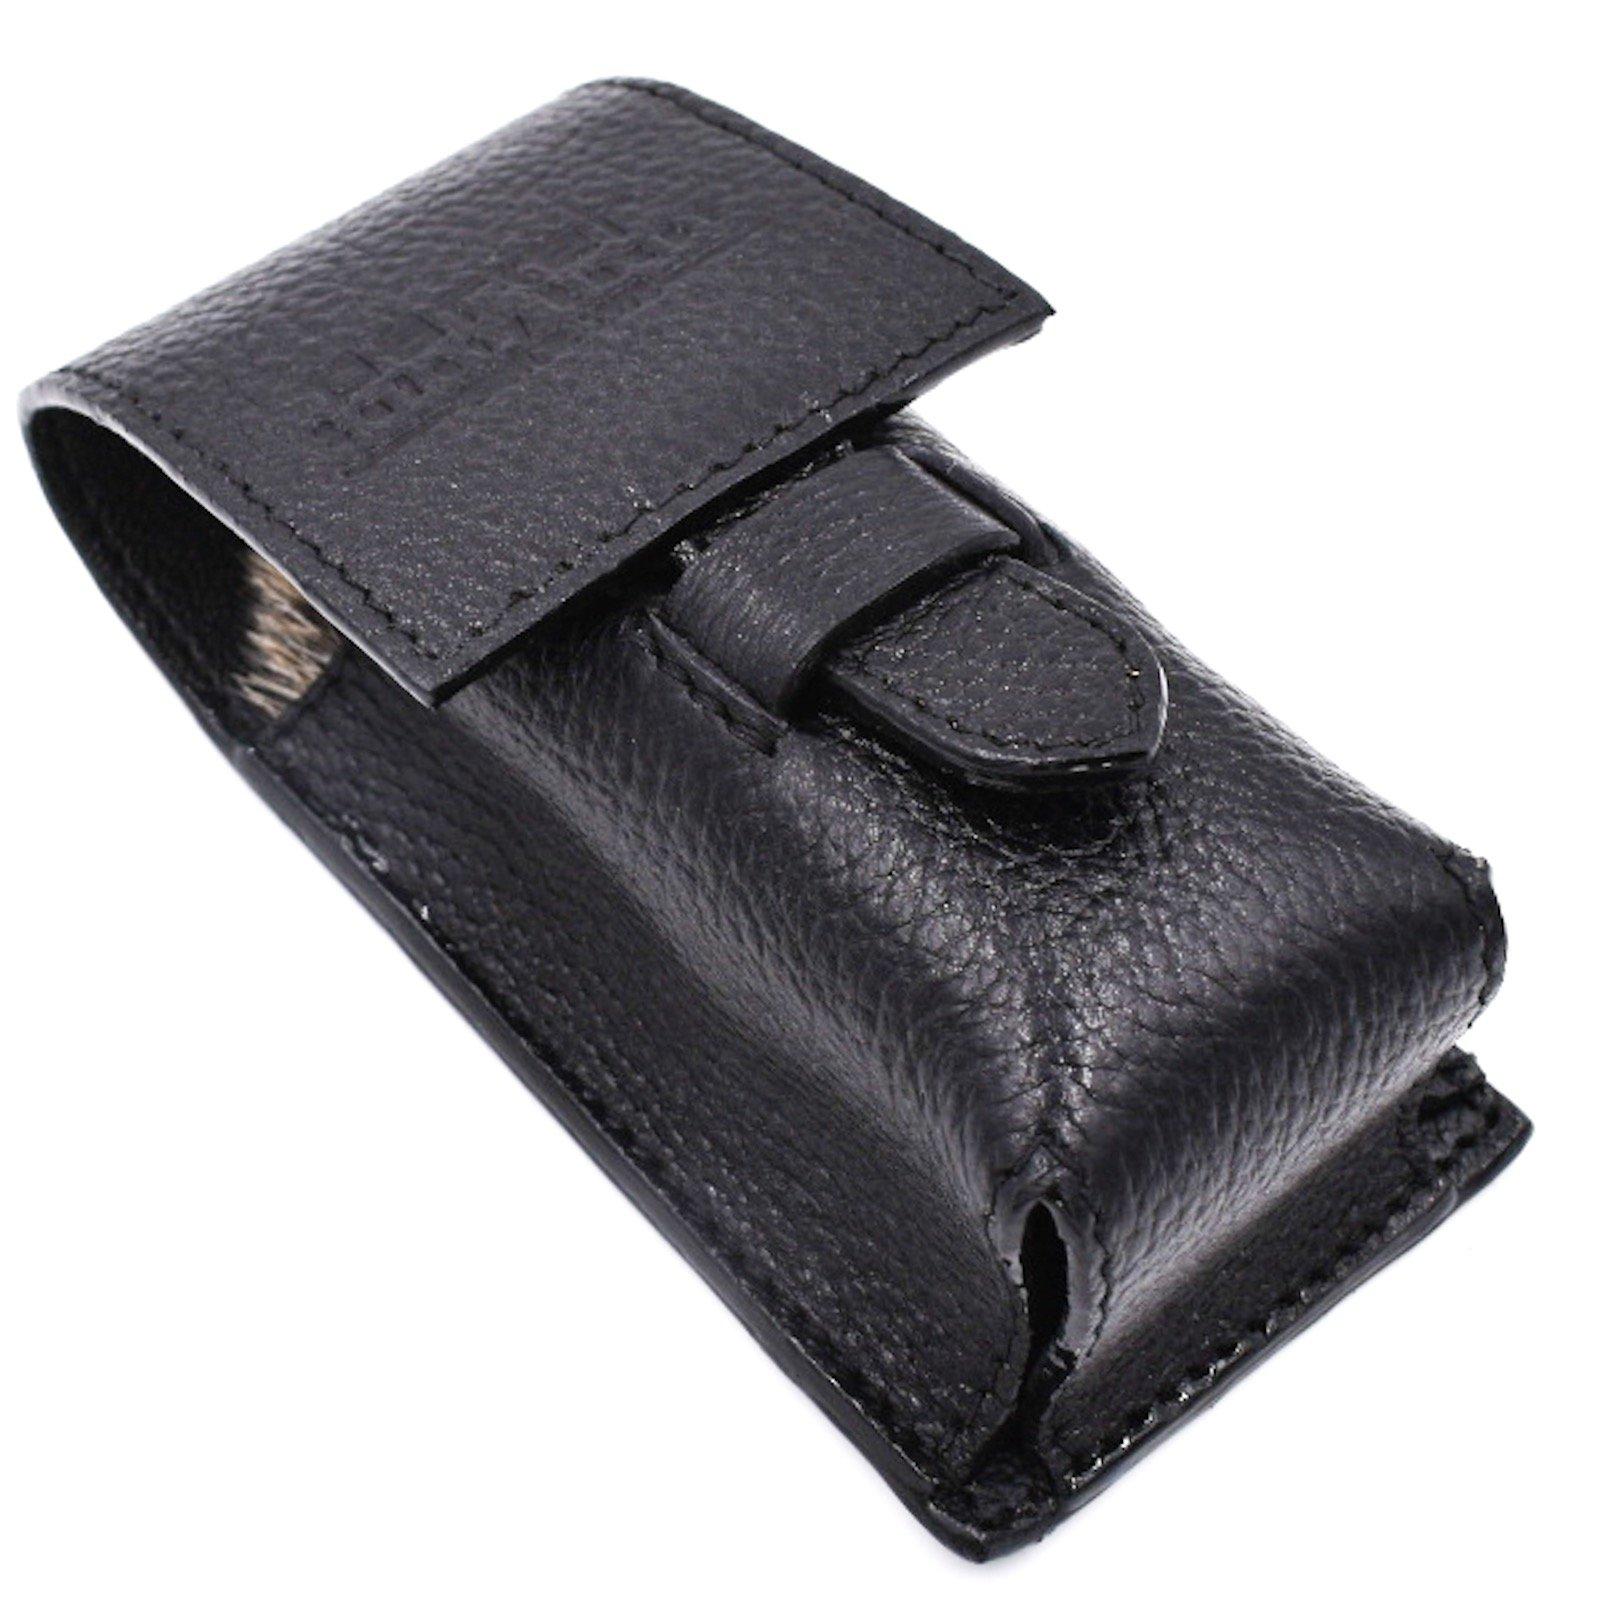 Genuine Leather Shaving Brush Protective/Travel Case